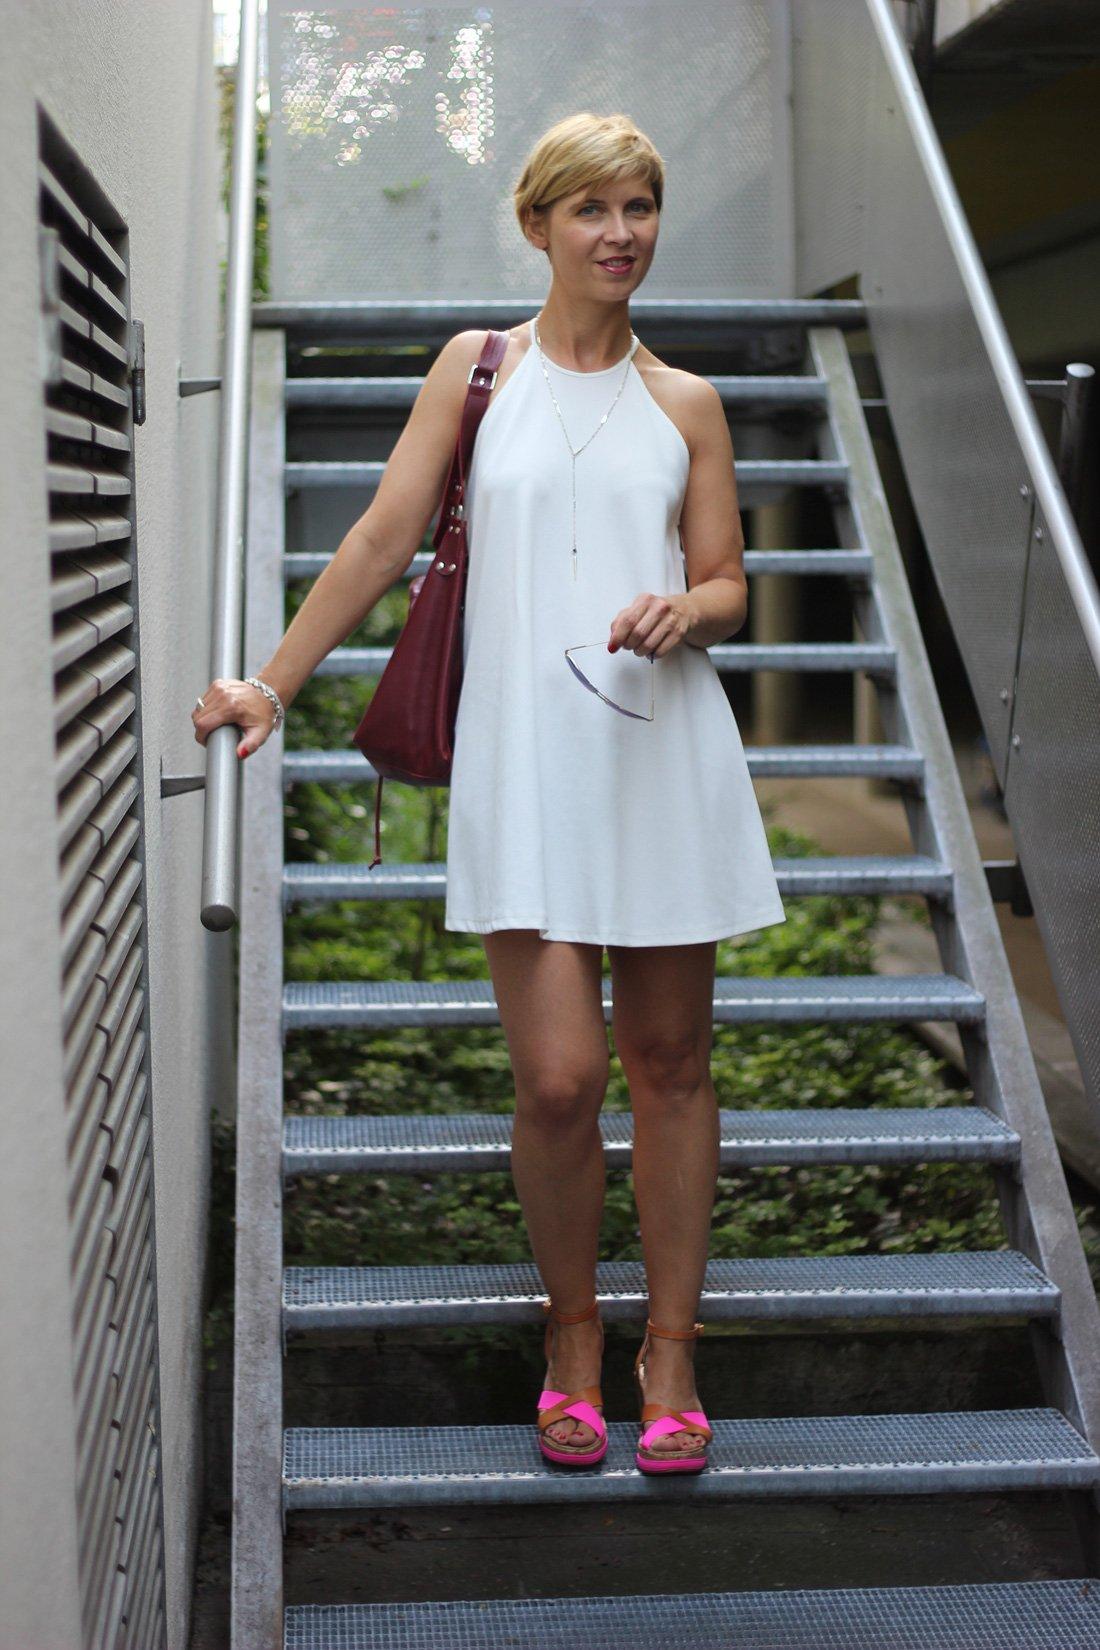 weißes Sommerkleid, Zara, Outfitblog, Conny Doll, Bata-Shoes, DIY-Tasche, Fashionblog, ü40, 40plus